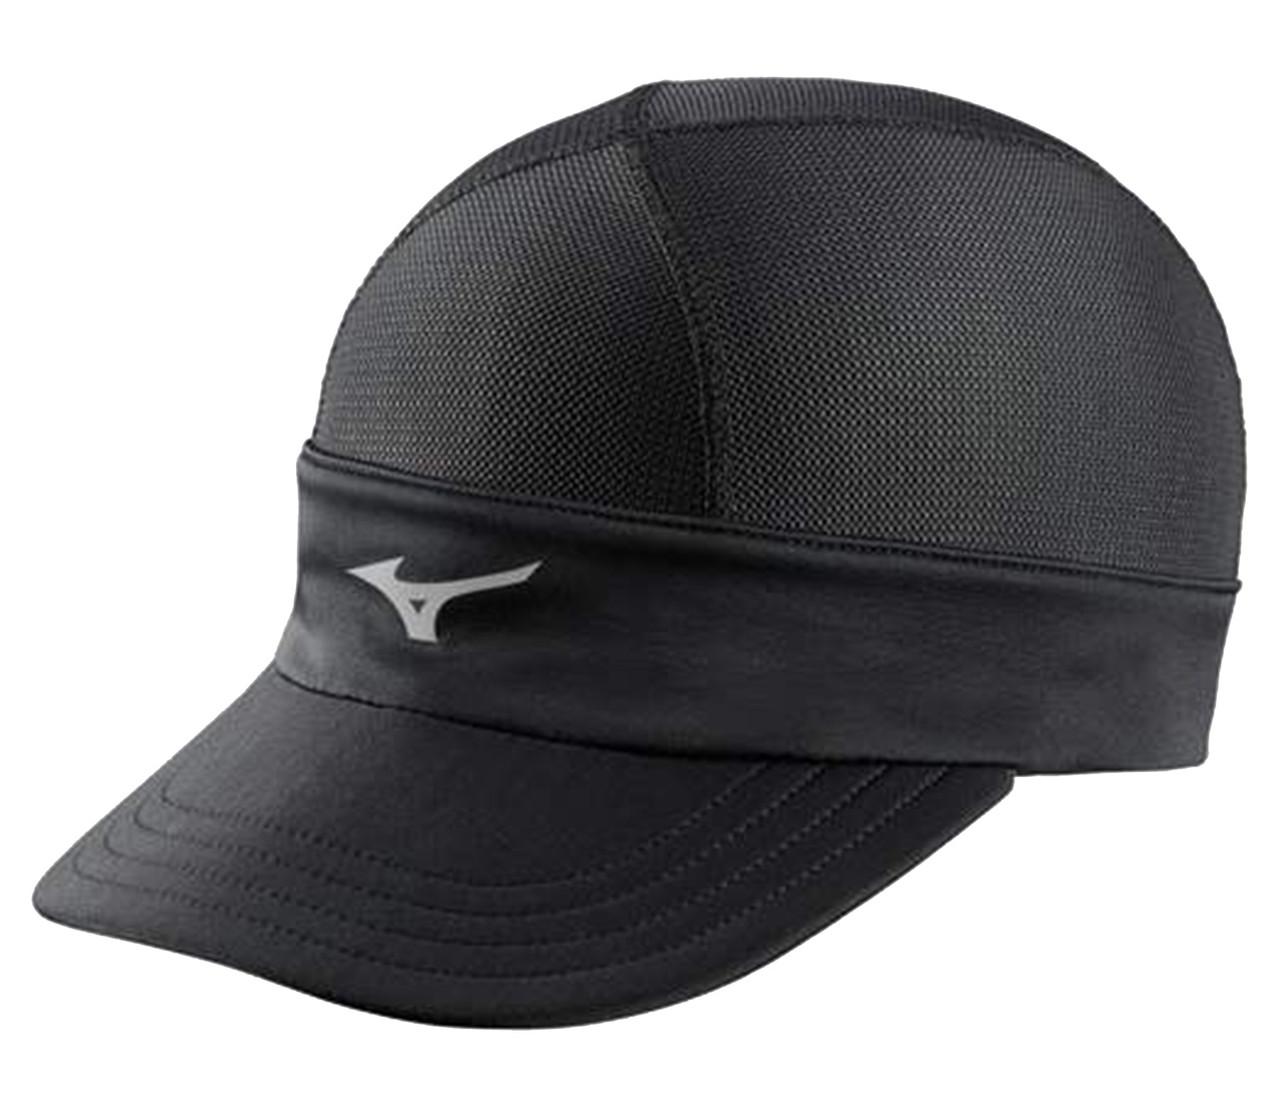 Бейсболка Mizuno Drylite Elite Cap II J2GW60011-09